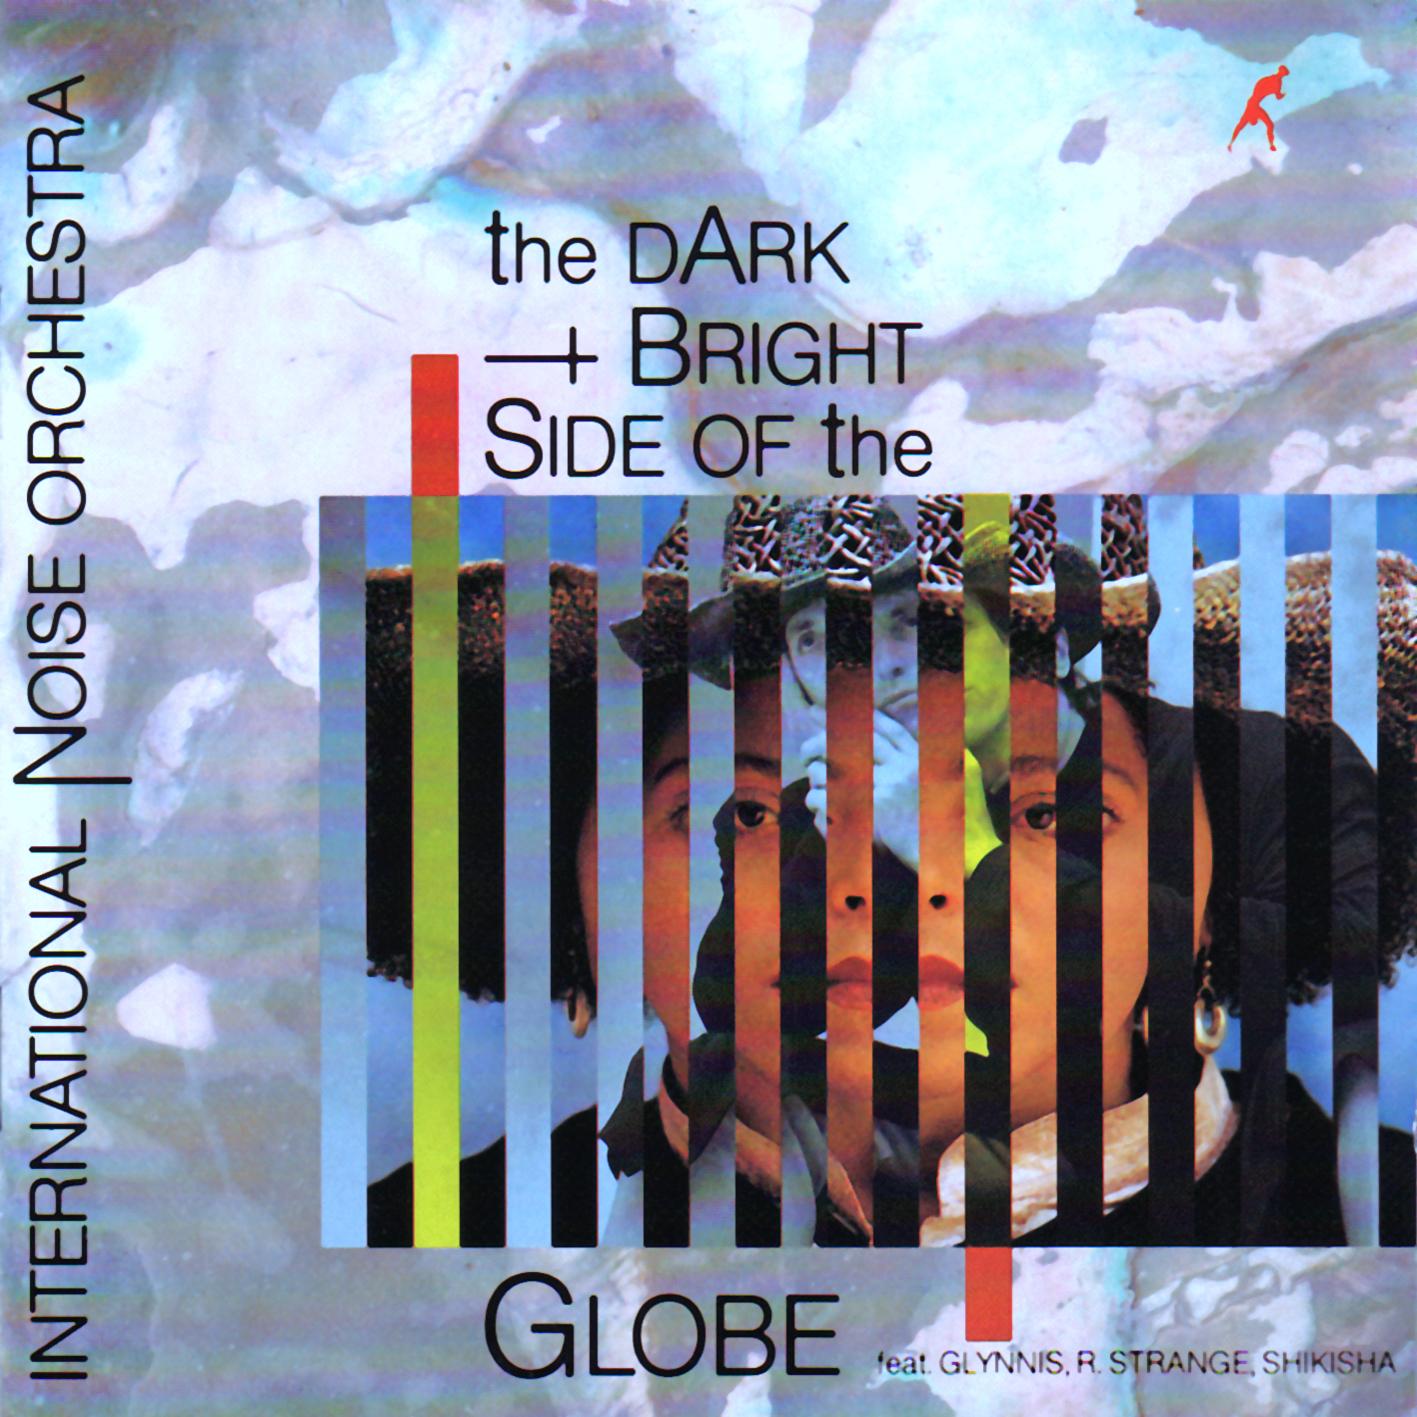 International Noise Orchestra - The Dark + Bright Side Of The Globe feat. Richard Strange